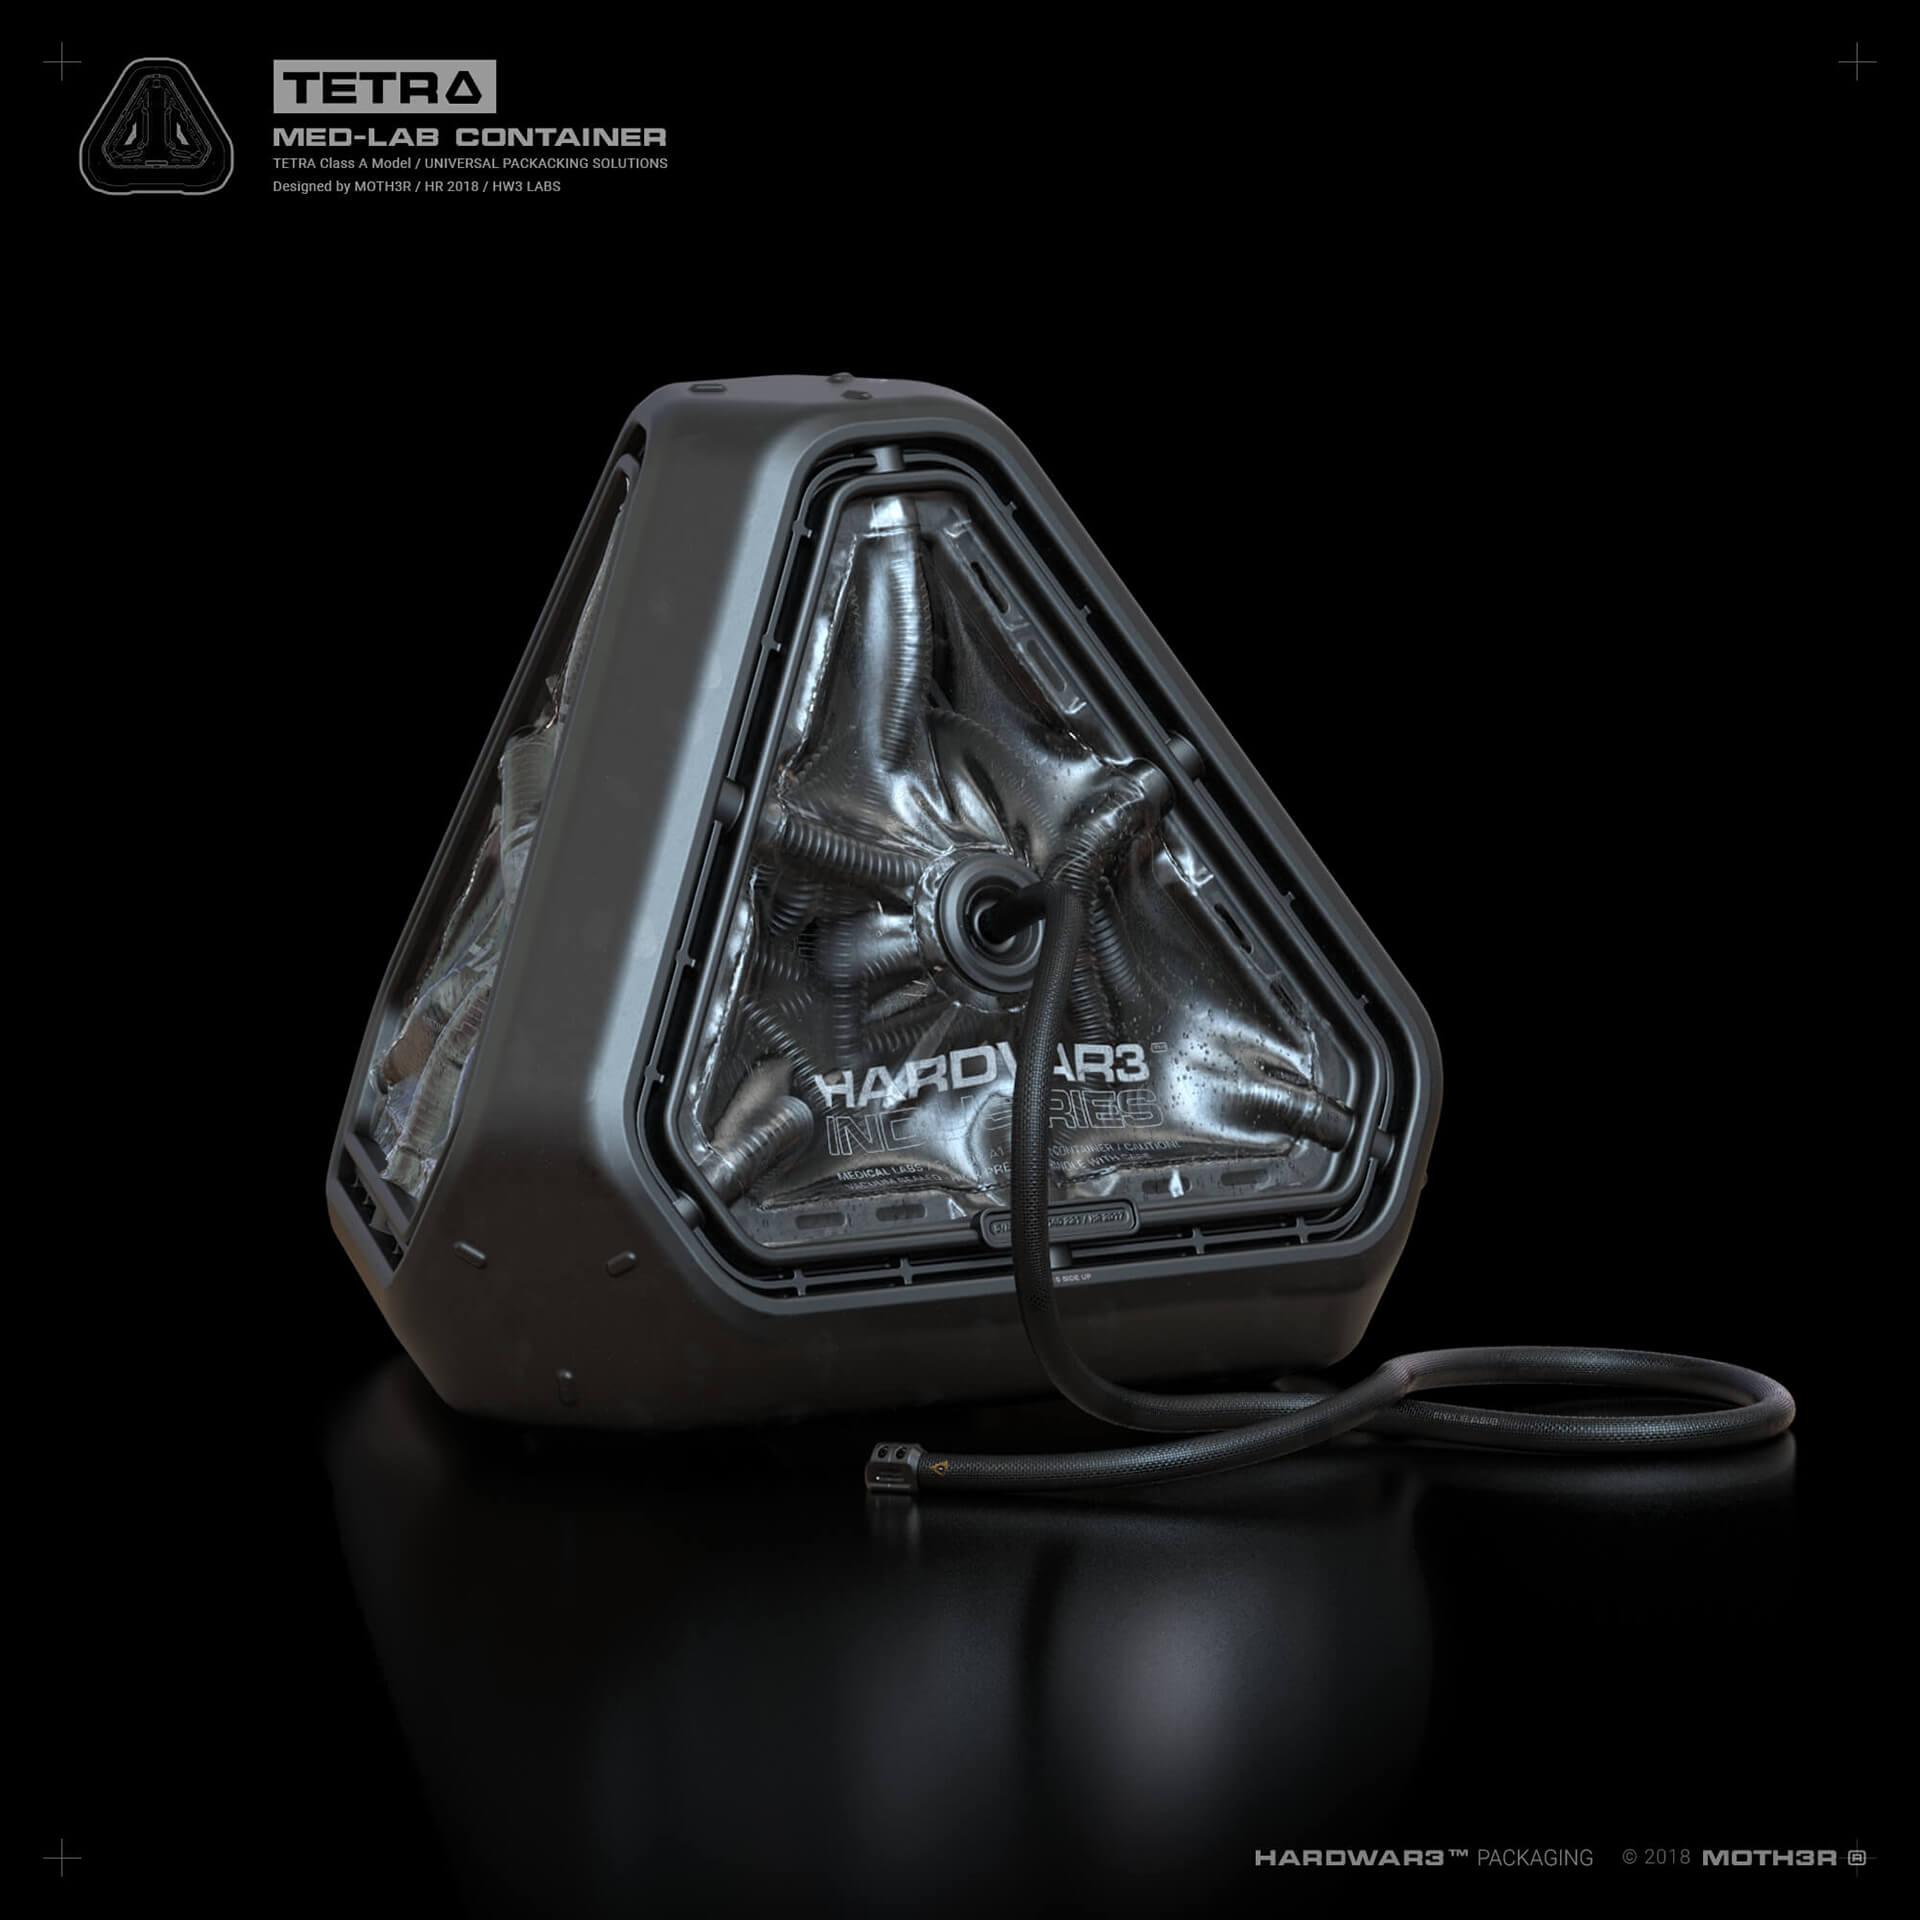 Tetra-b01.222